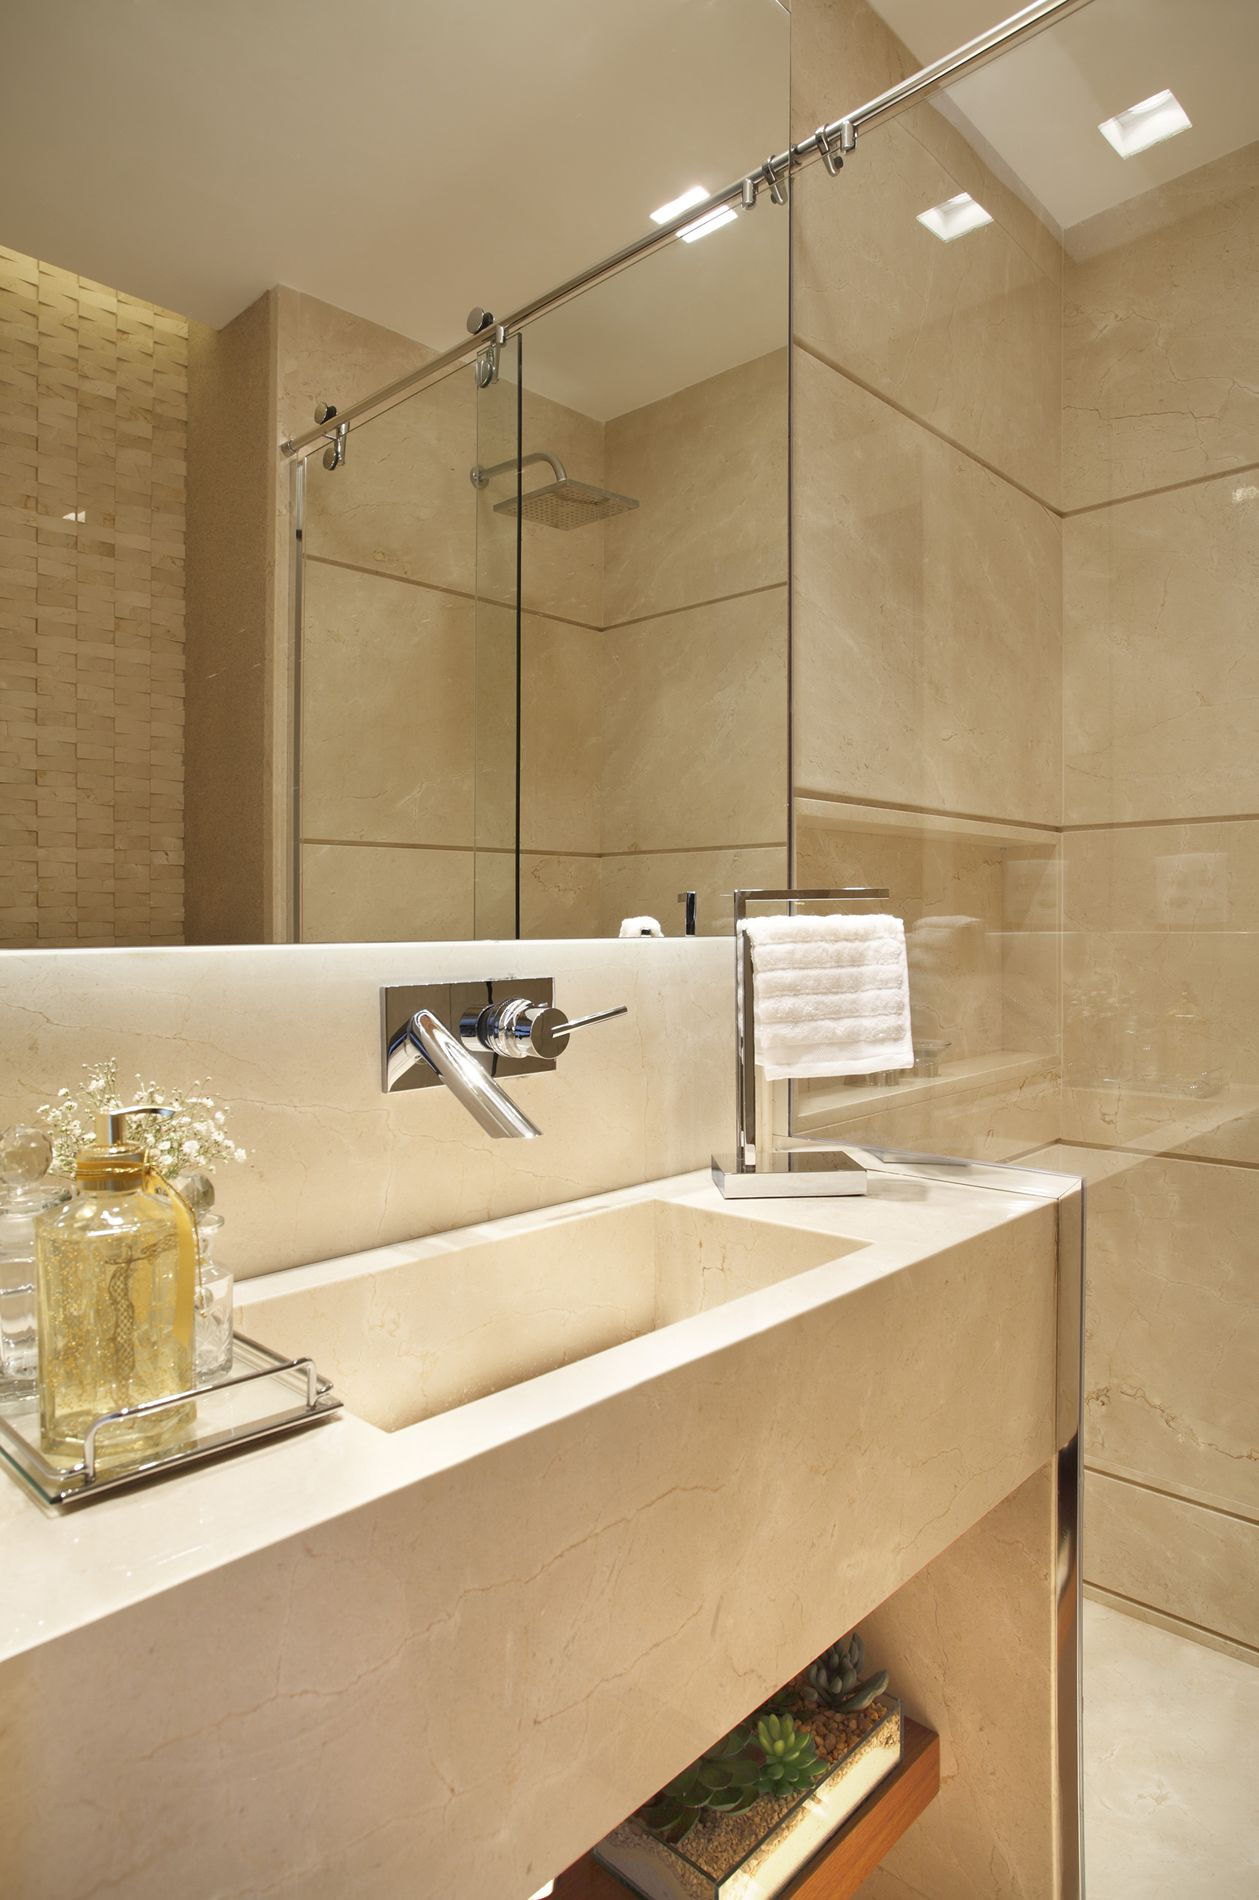 banheiros banheiros banheiros banheiros banheiros banheiros banheiros  #A78324 1259 1900